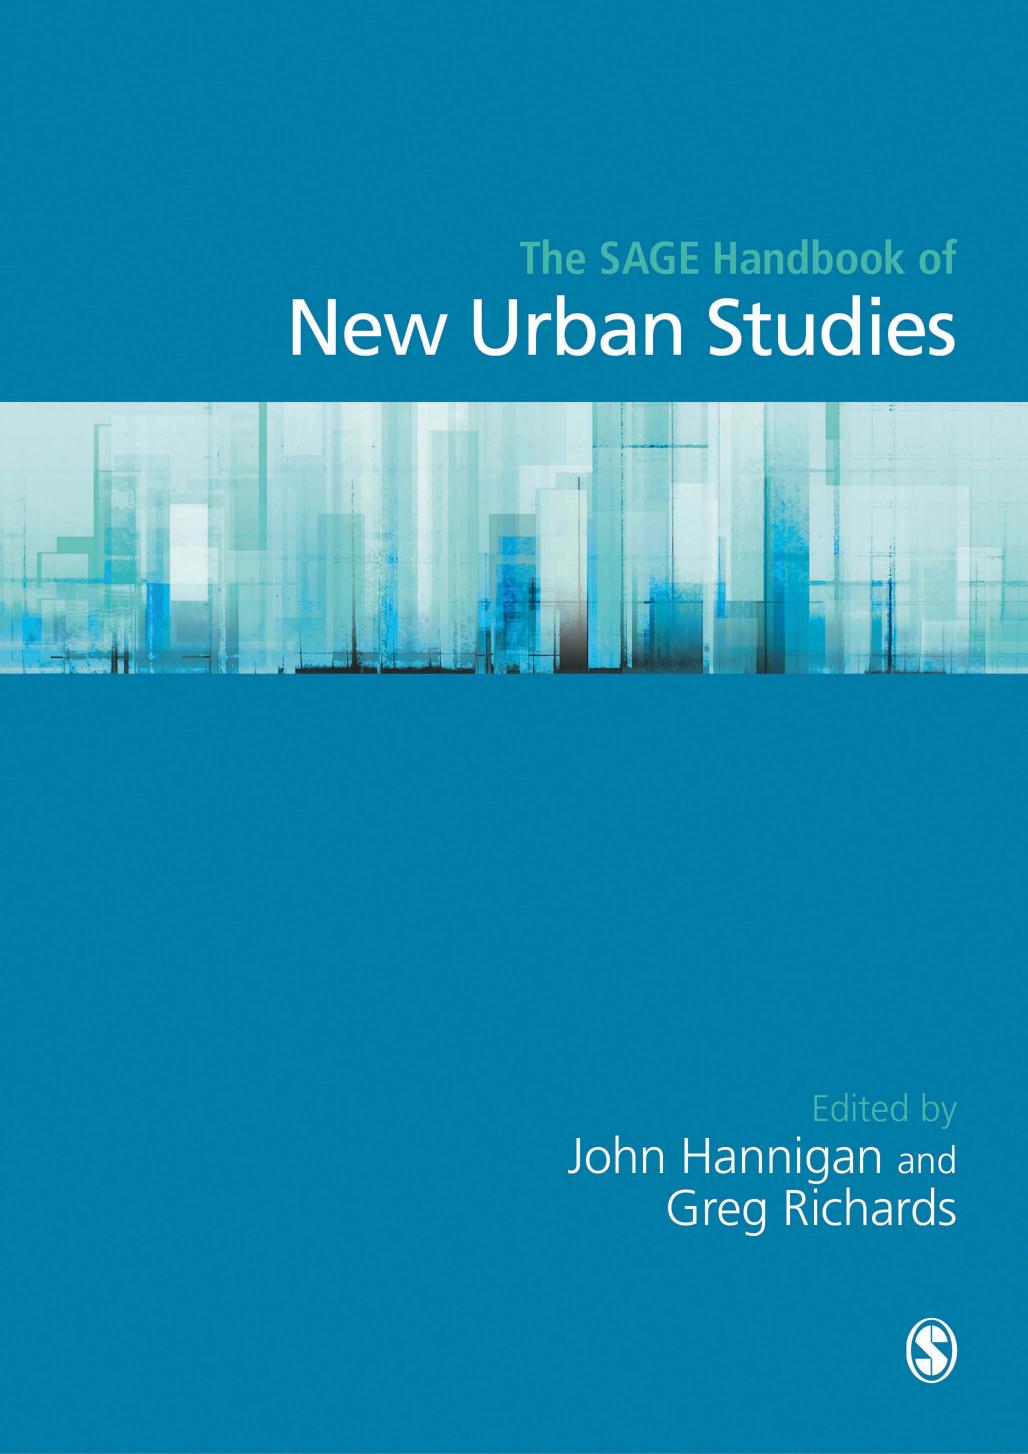 2017. NEW URBAN STUDIES AND TOURISM. RICHARDS